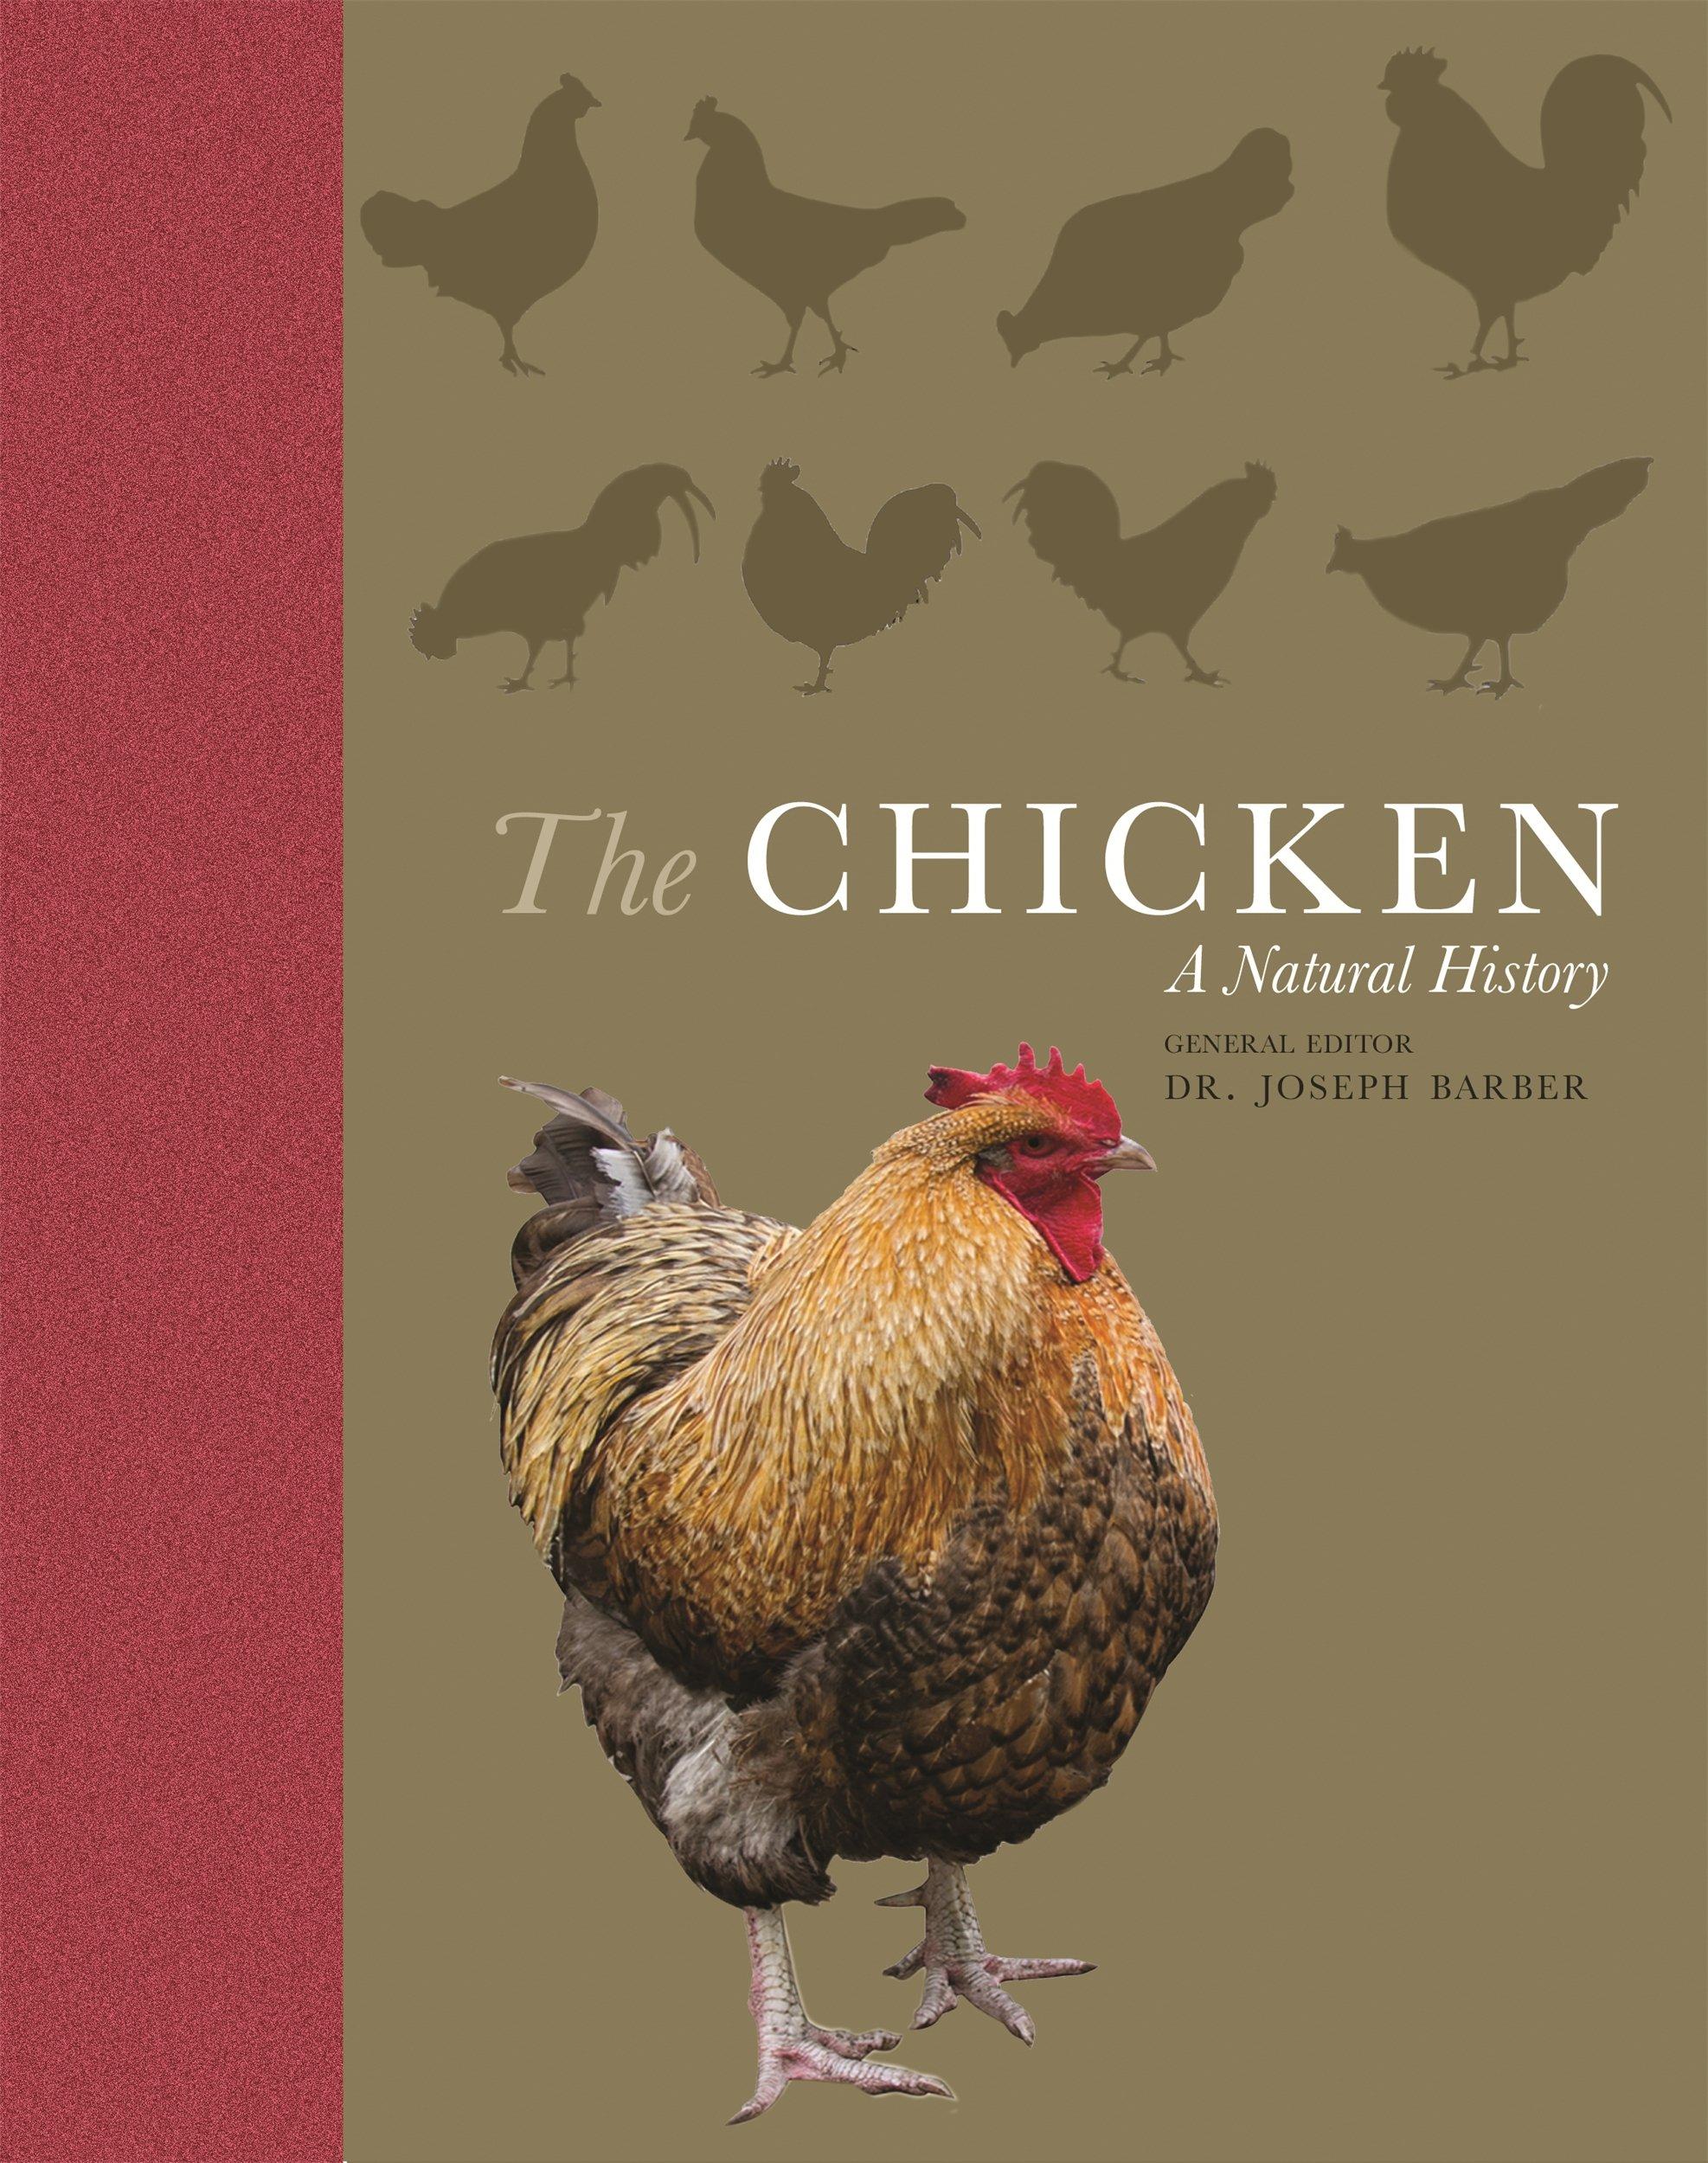 The Chicken: A Natural History: Joseph Barber: 9780691182469: Amazon ...